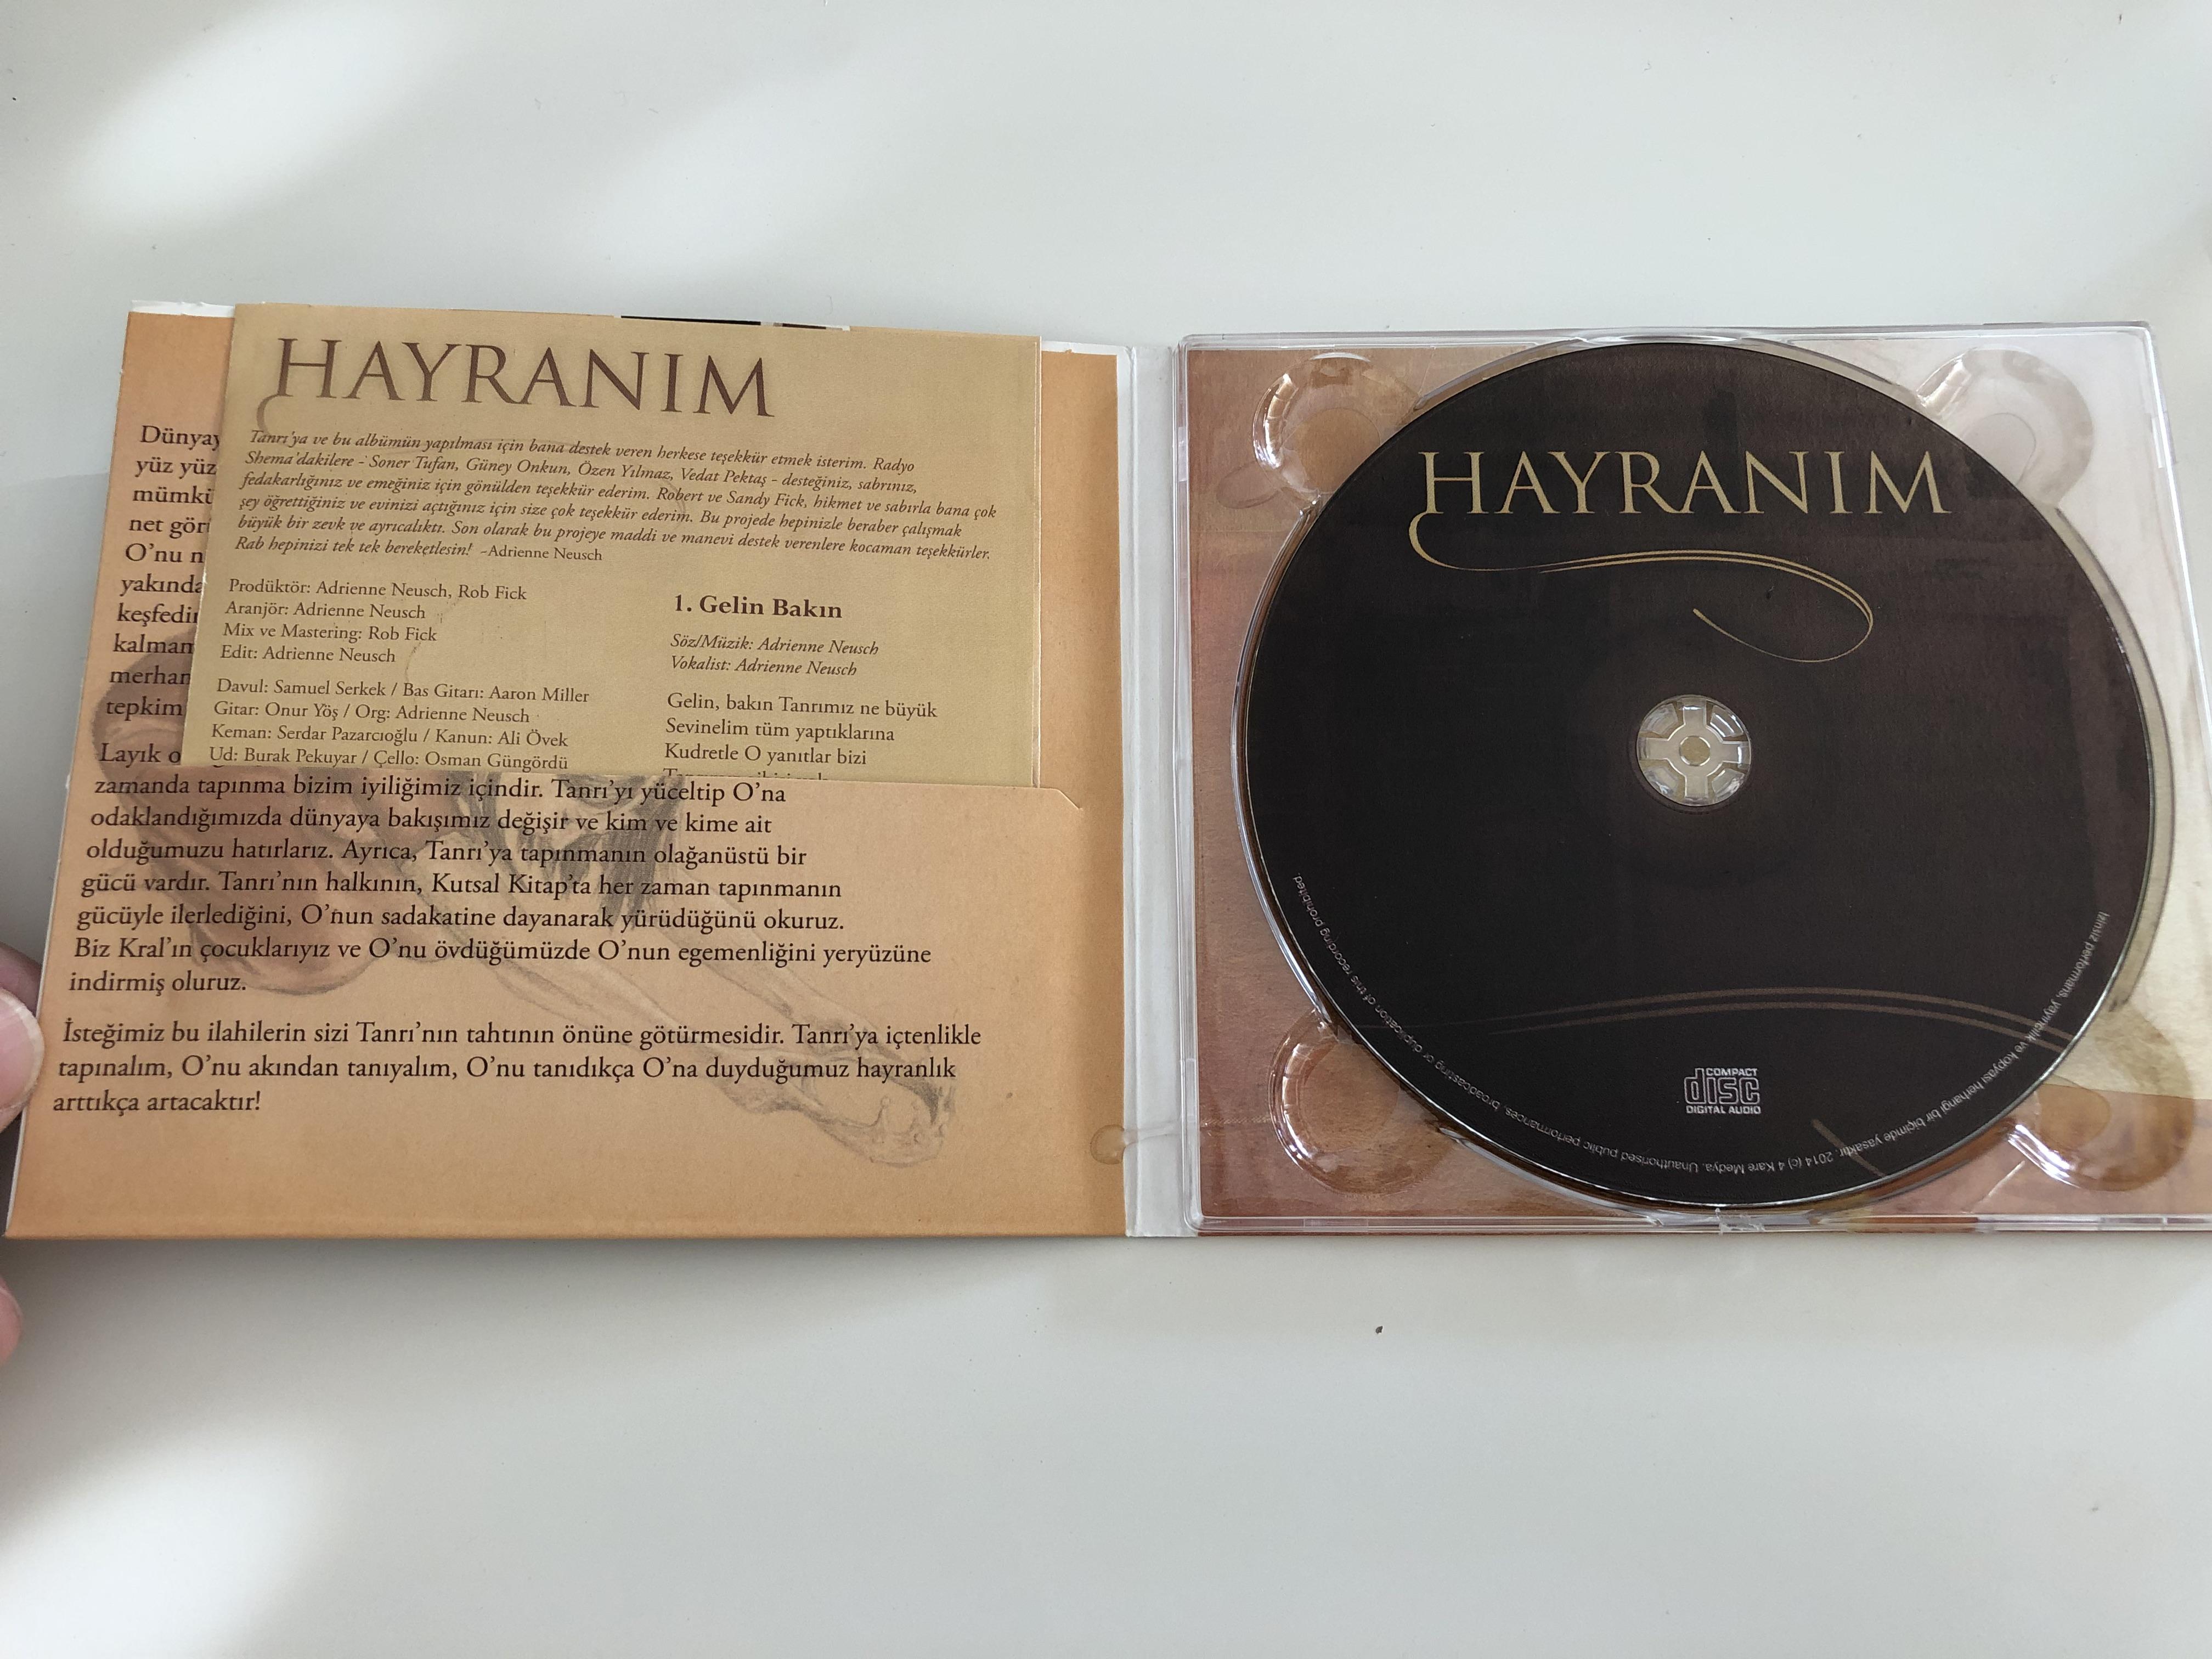 hayranim-gelin-bakin-rab-iyidir-d-nya-dolsun-davut-un-duasi-inanirim-turkish-language-christian-praise-and-worship-audio-cd-2014-2-.jpg